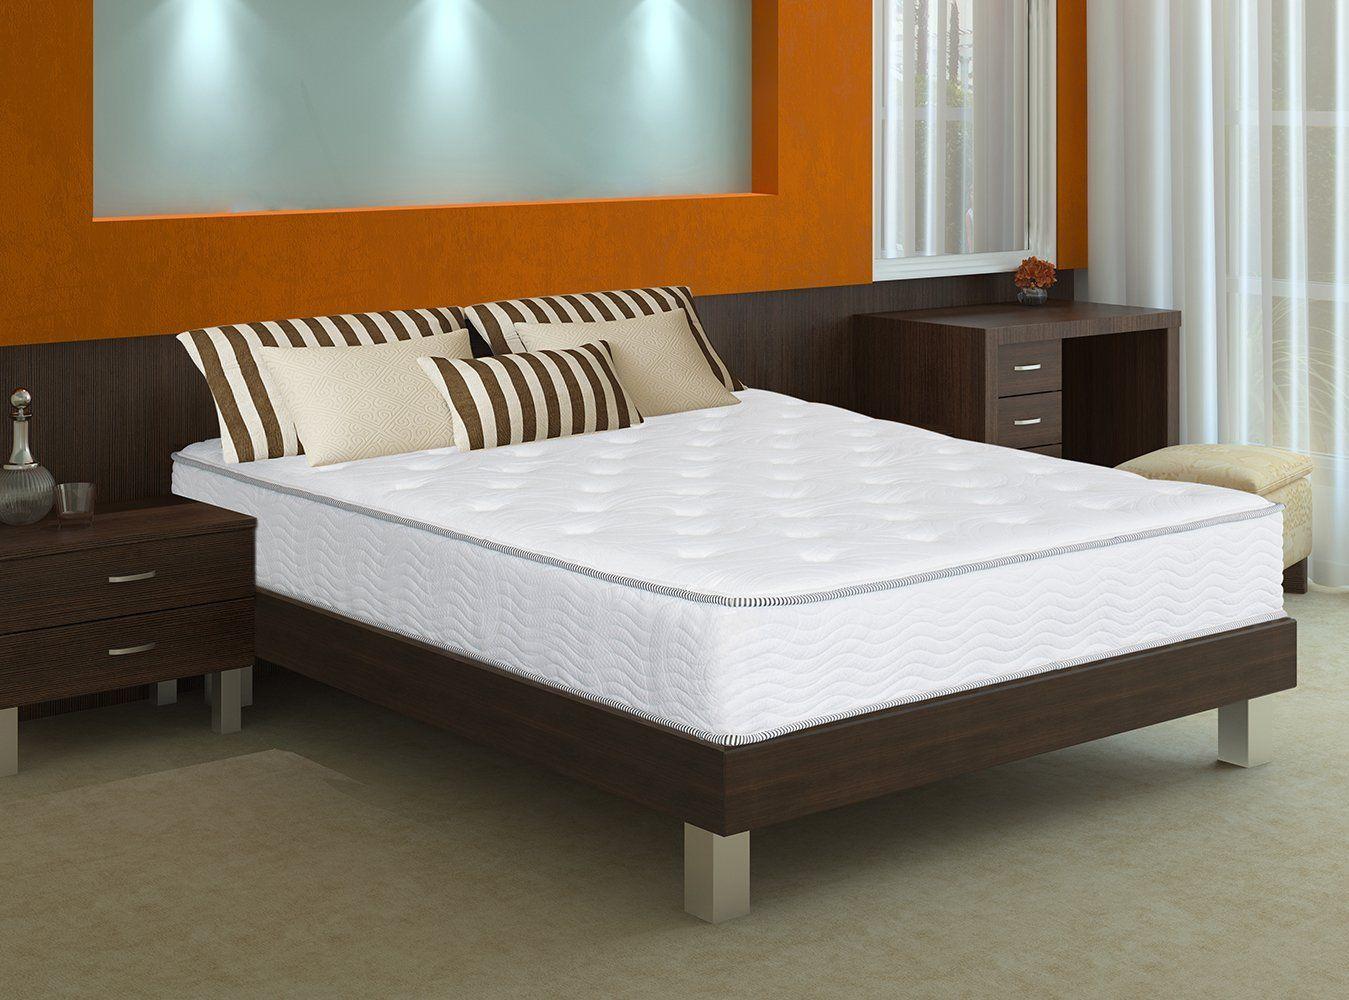 2018 rv bunk bed mattress interior design ideas for bedrooms check